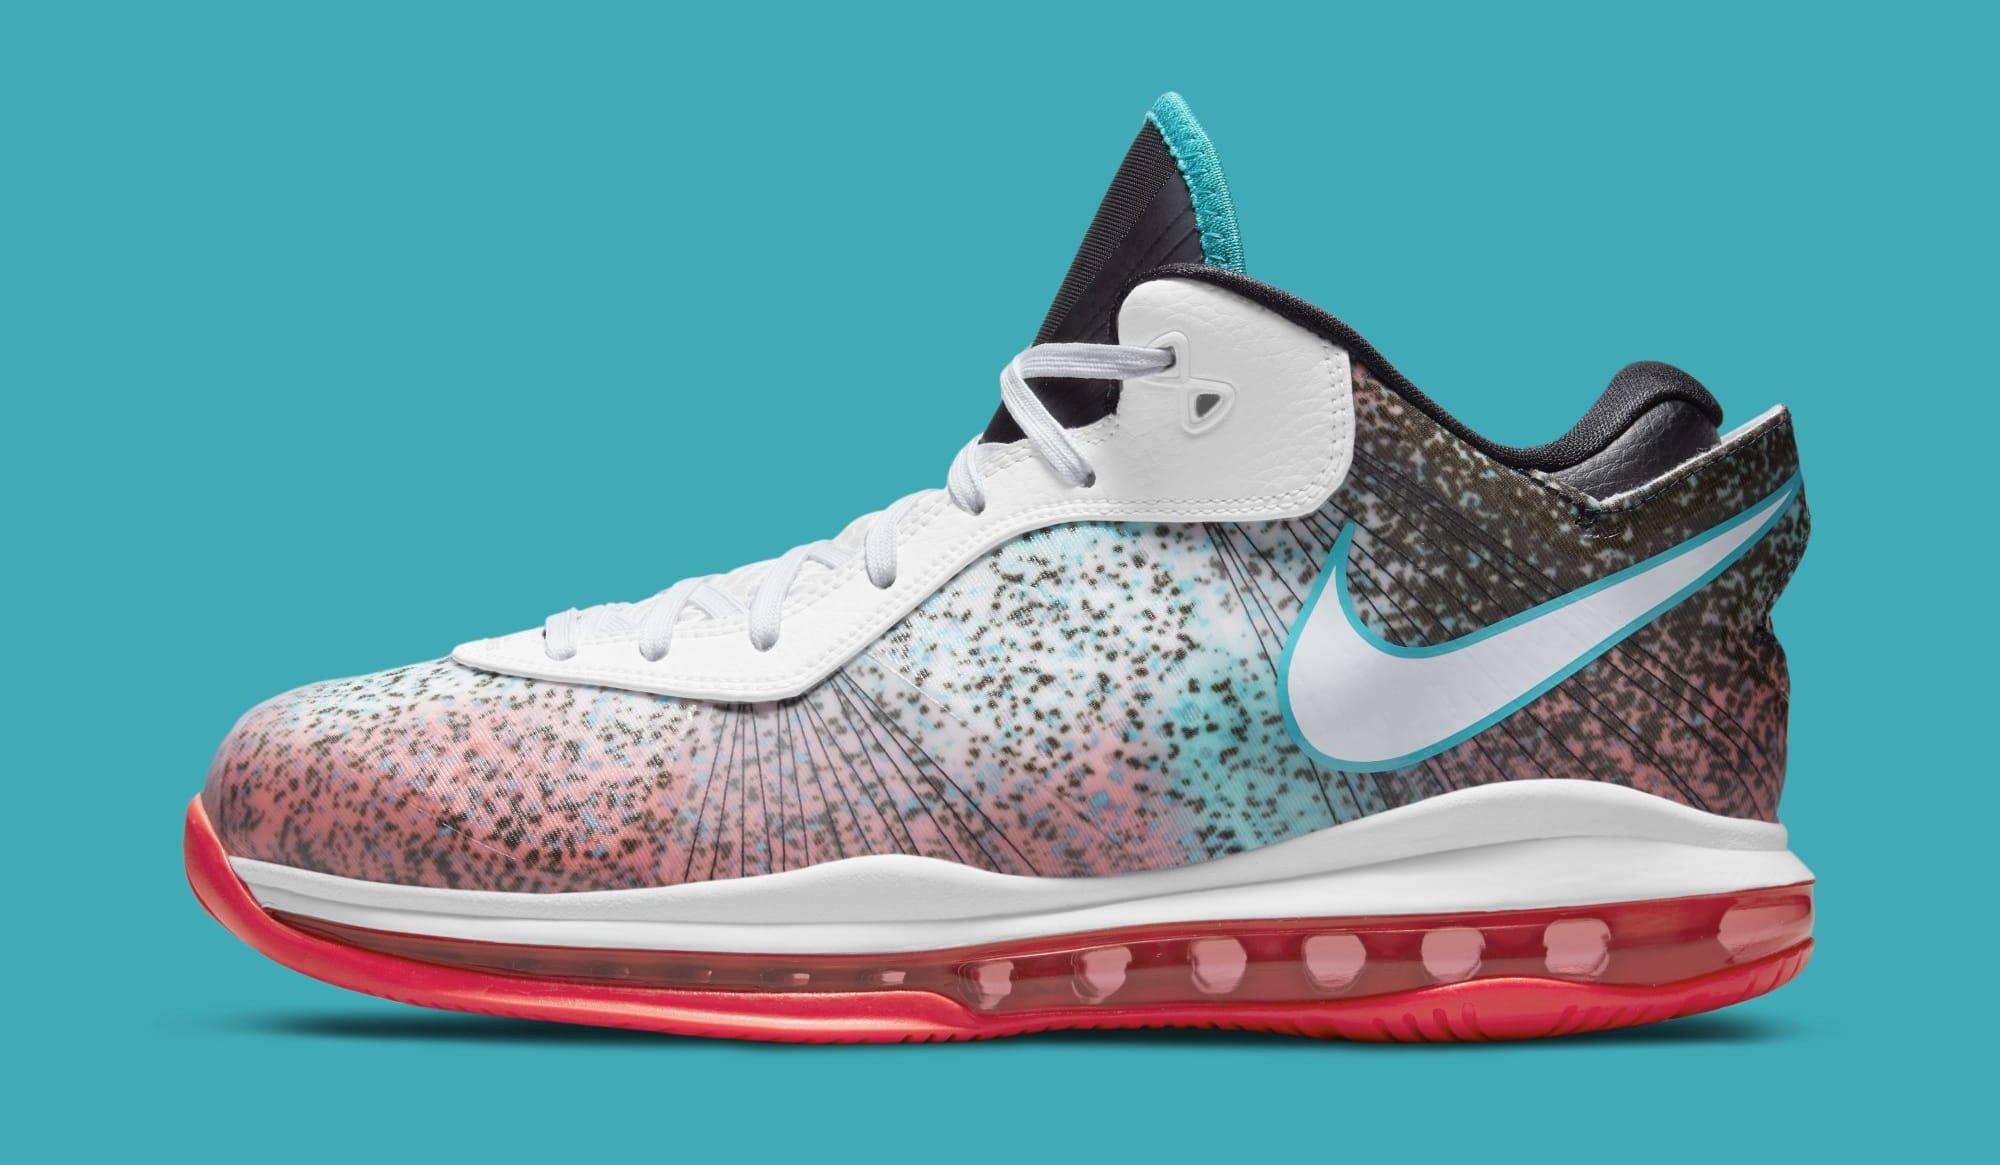 Nike LeBron 8 V2 Low 'Miami Nights' 2021 DJ4436-100 (Medial)